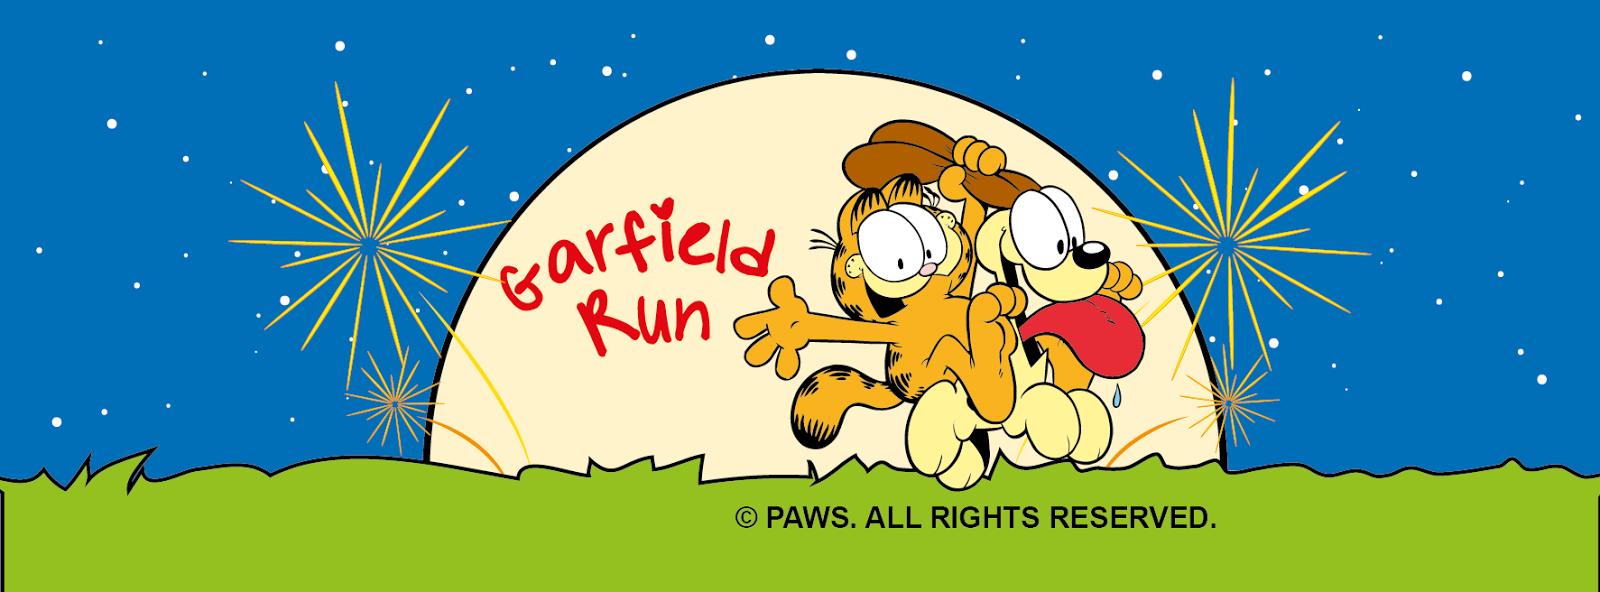 Fat Old Man Running Garfield Run 2014